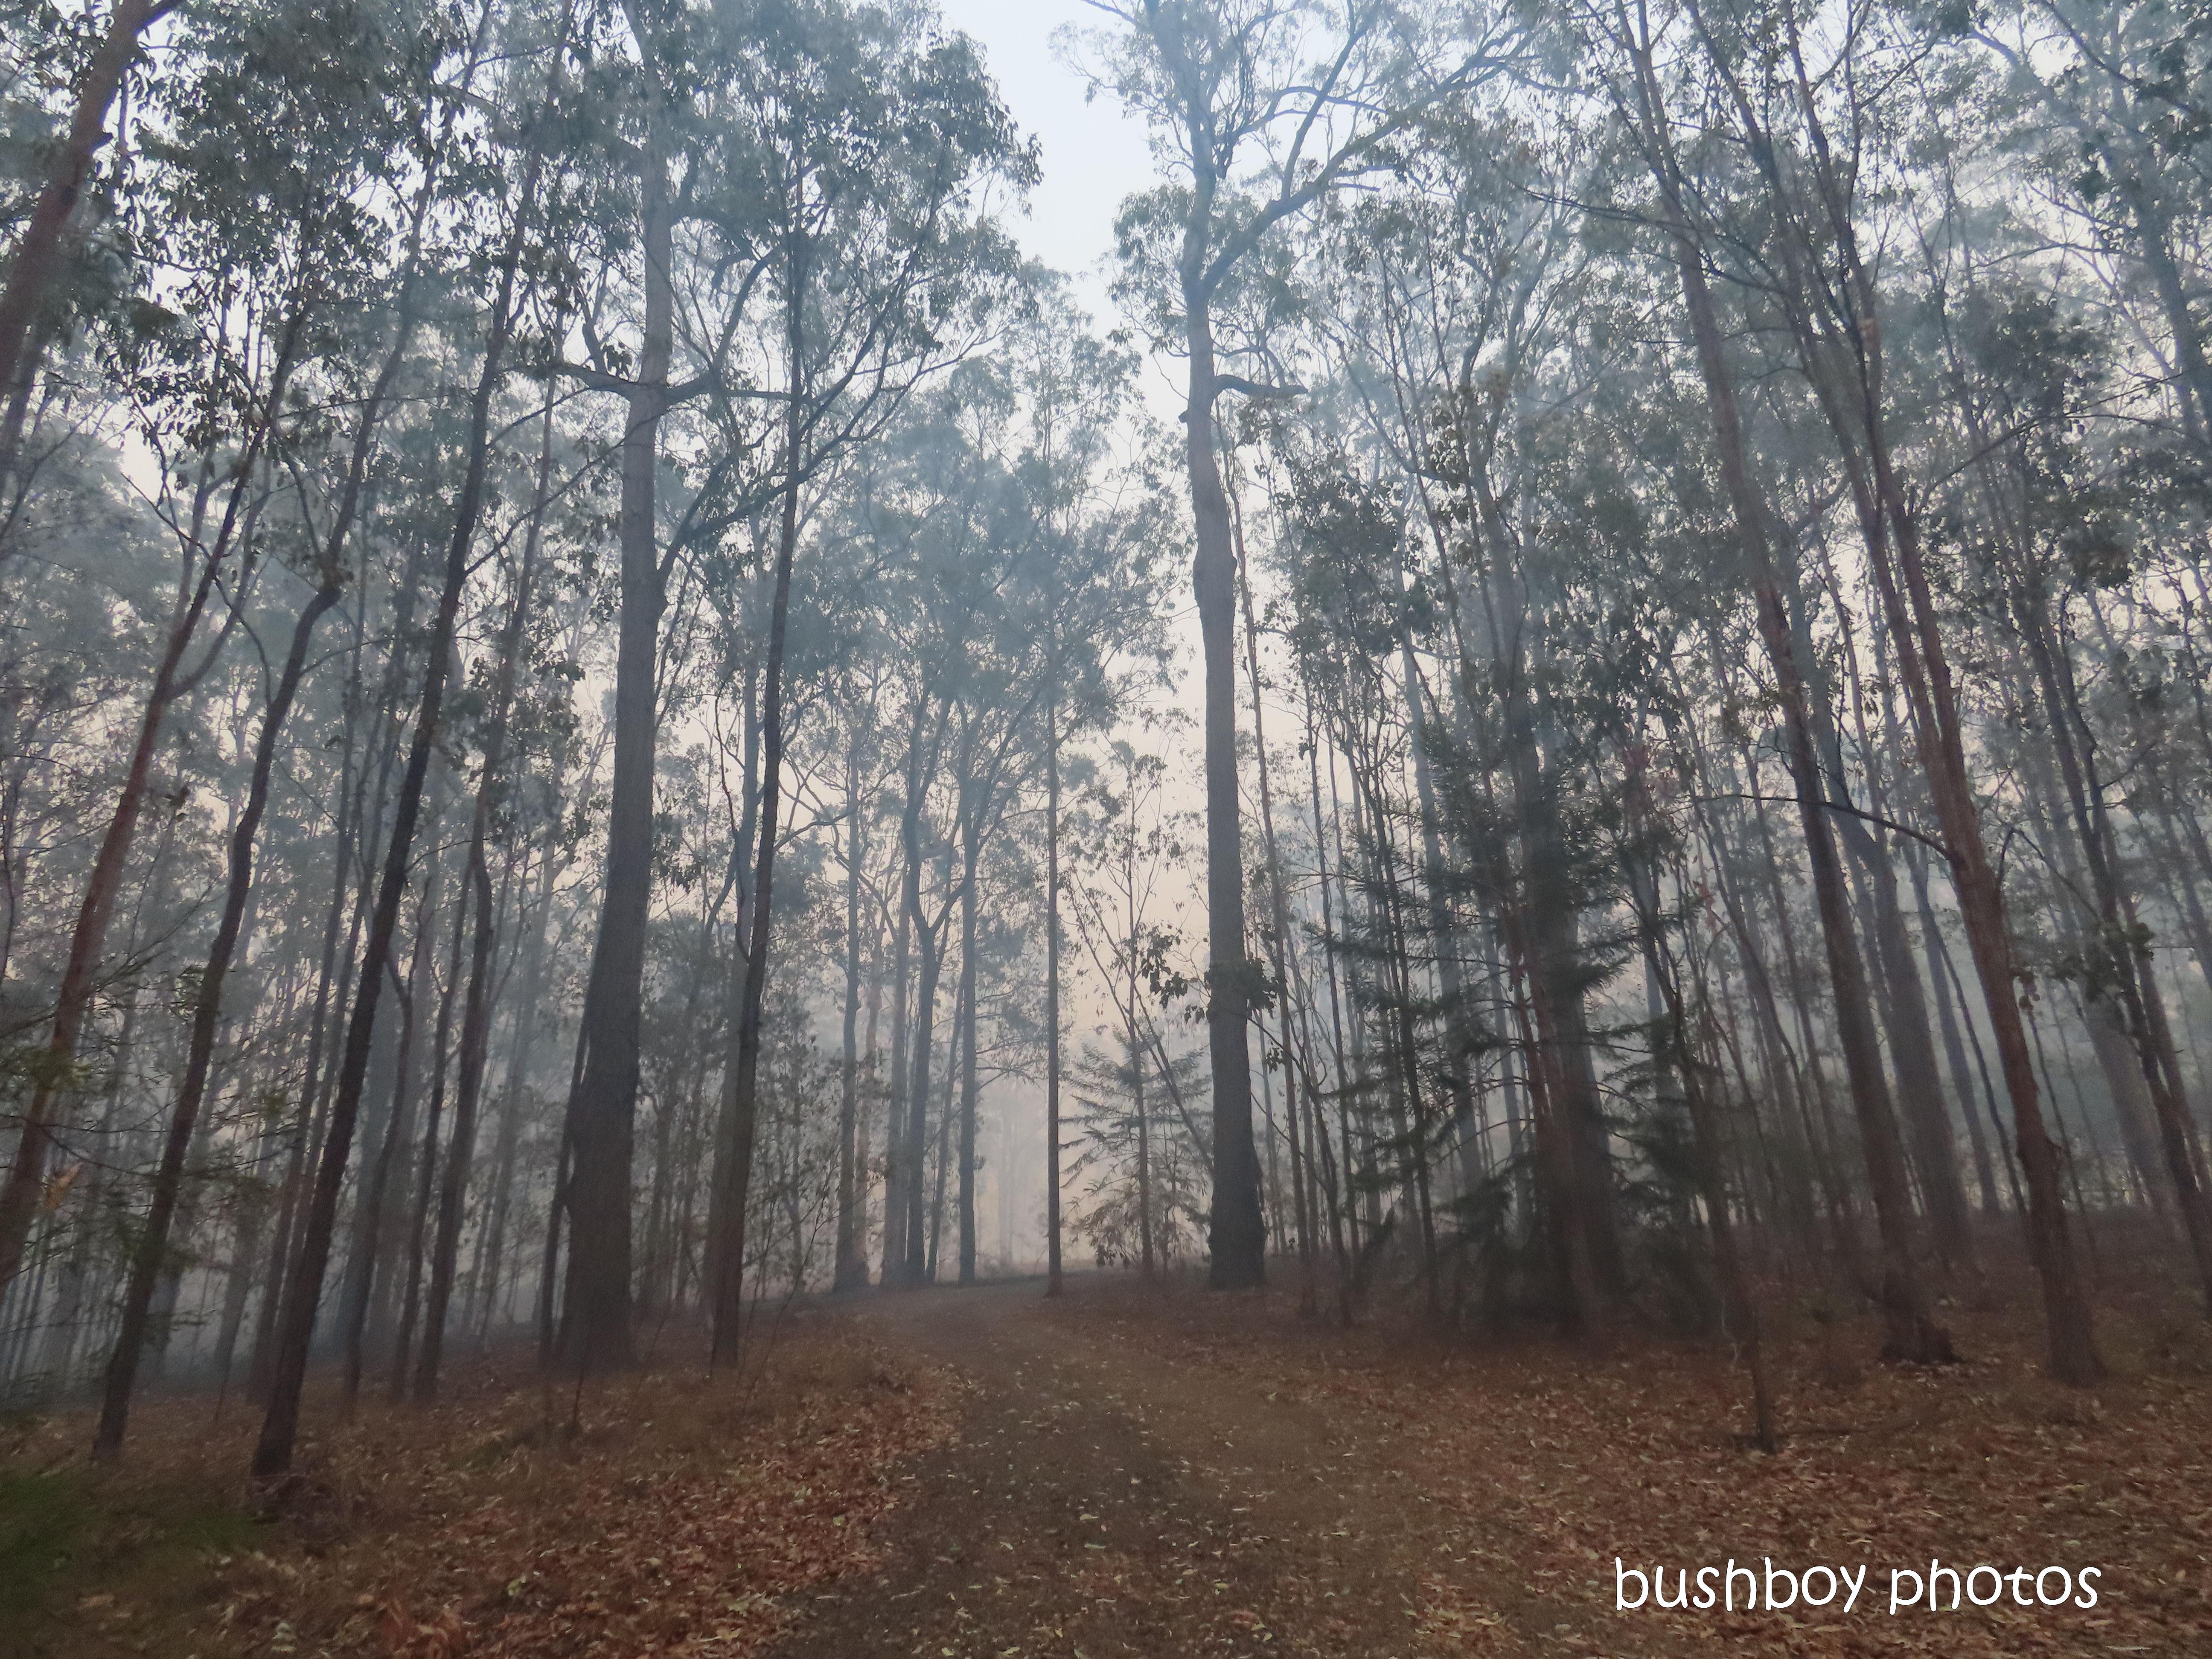 driveway_smoke_durranbah_blog_fire_post_dec 2019